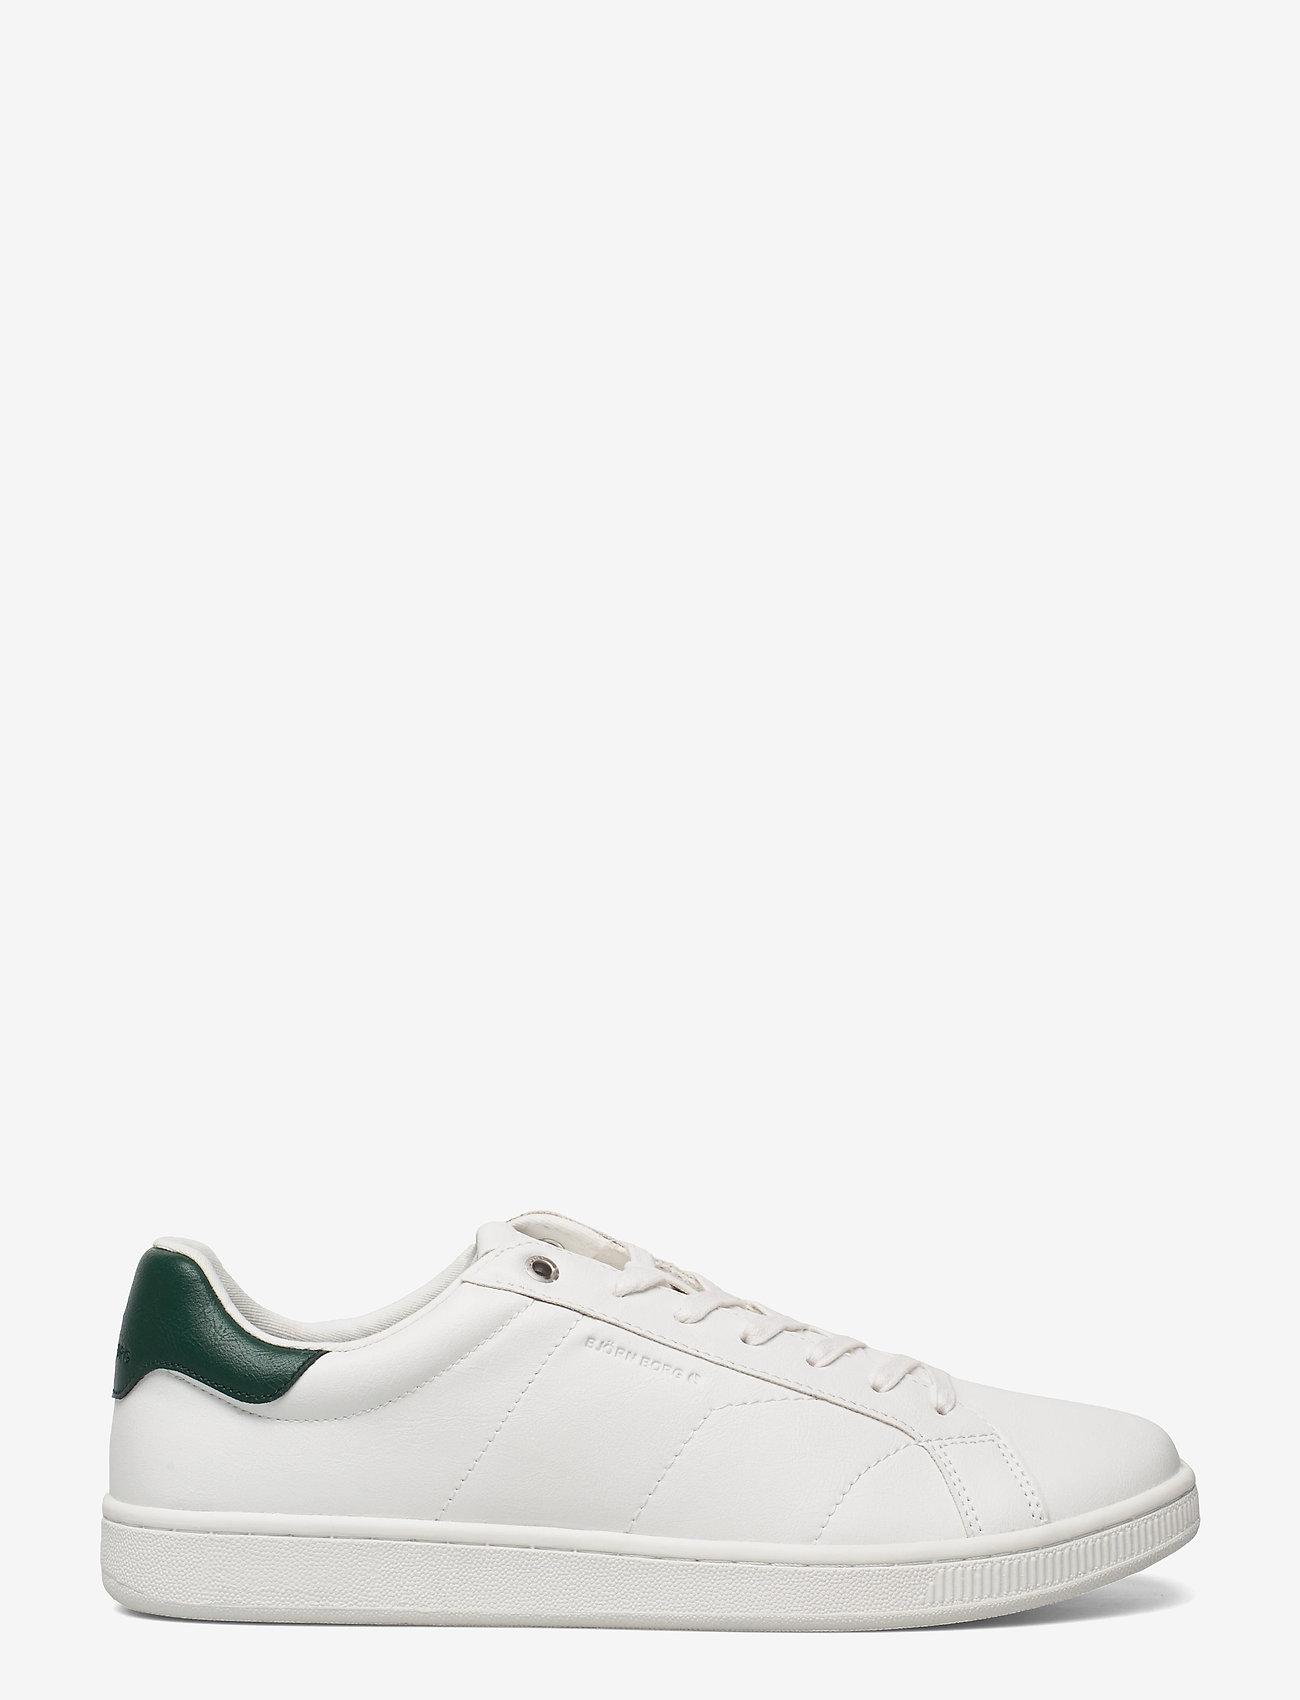 Björn Borg - T305 CLS BTM M - laag sneakers - white/green - 1